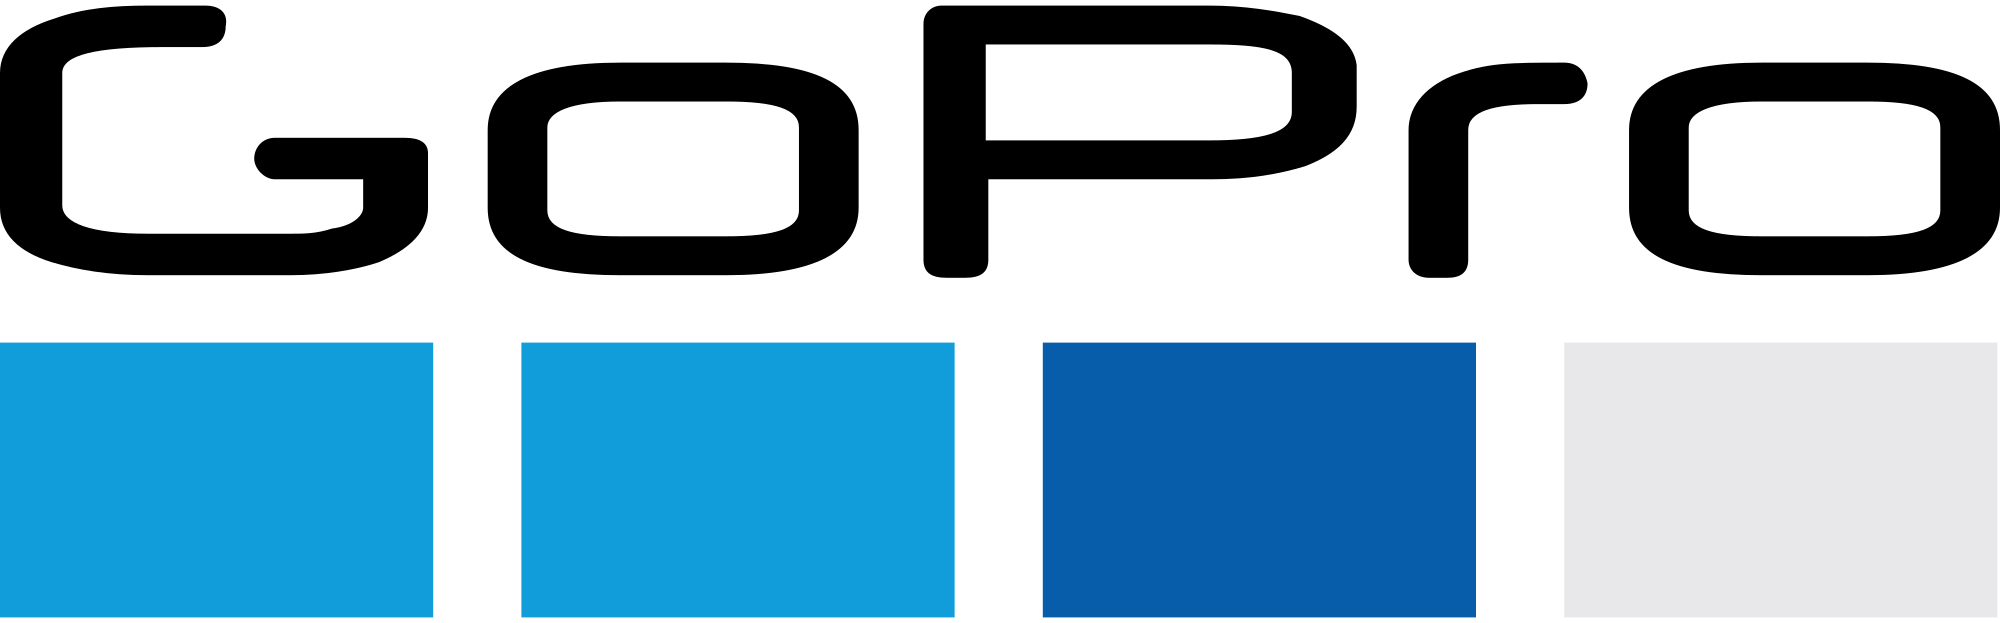 2000x623 Filegopro Logo Light.svg